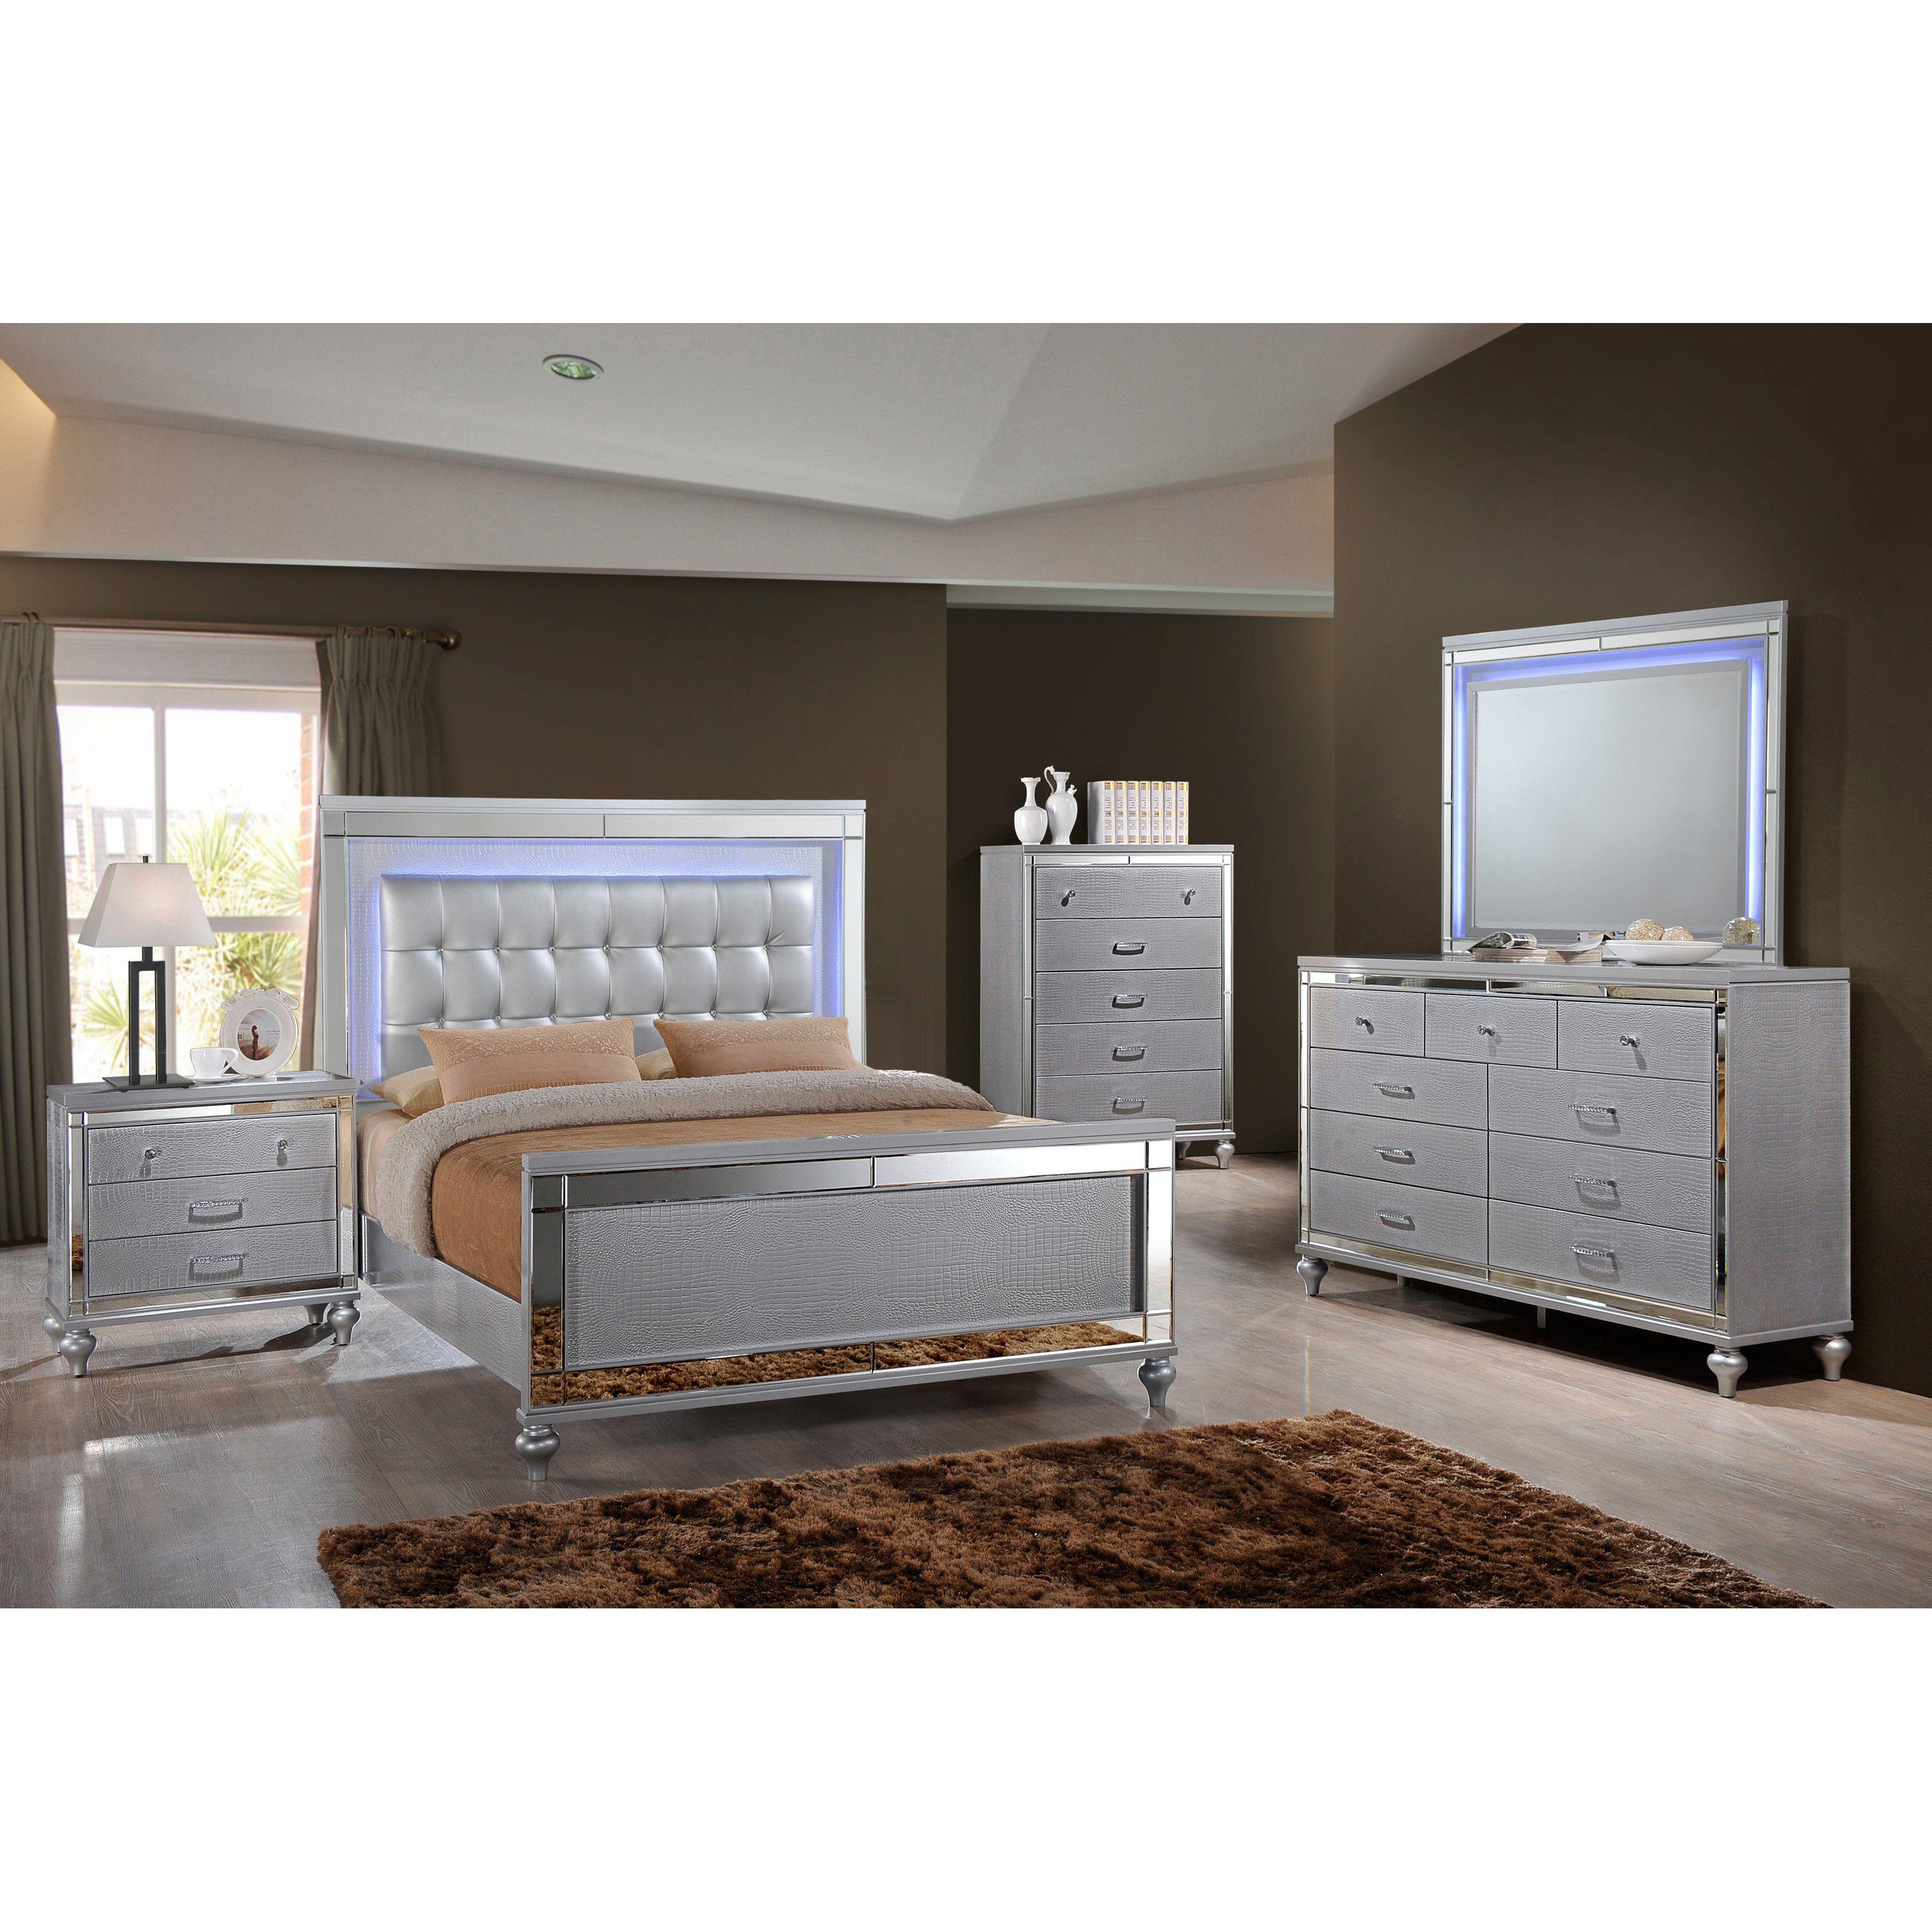 Home Source Industries Kelly Platform Bed Set - H-1005-Q5PC